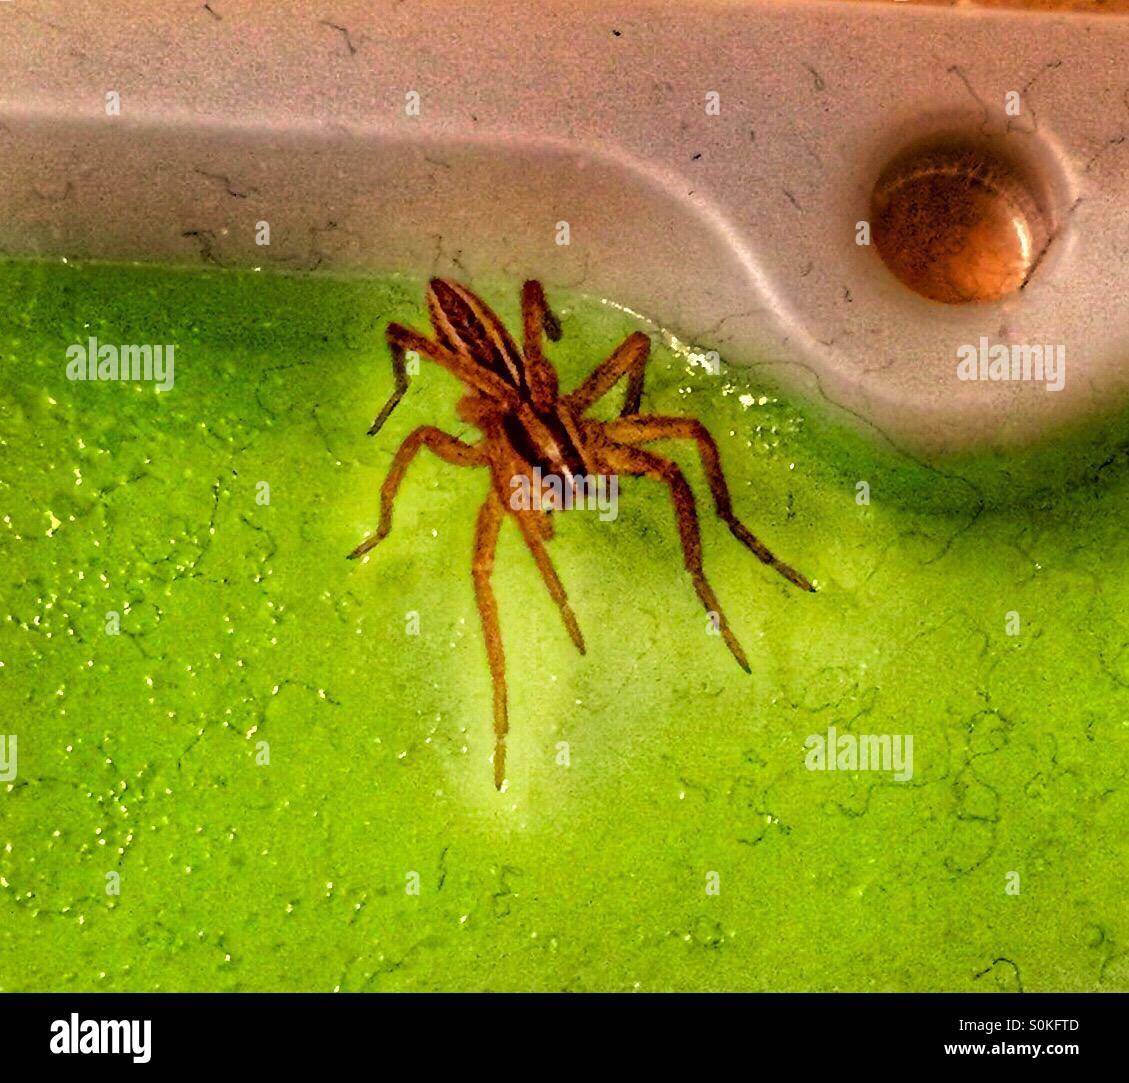 Spider stuck on sticky trap Stock Photo